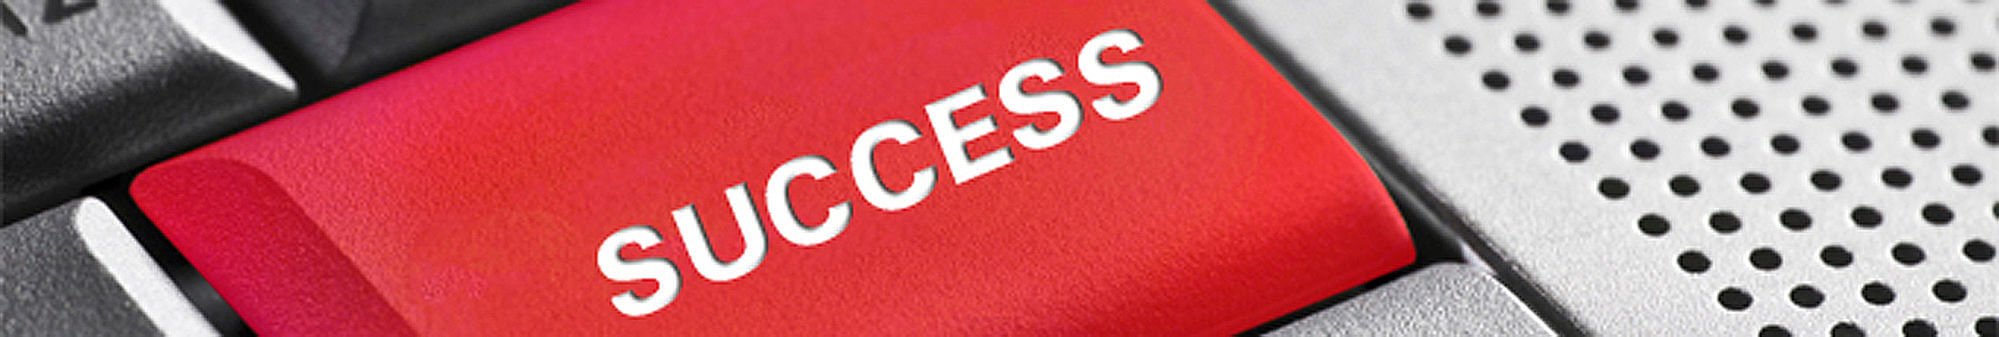 Titelbild Erfolgsgeschichten englisch